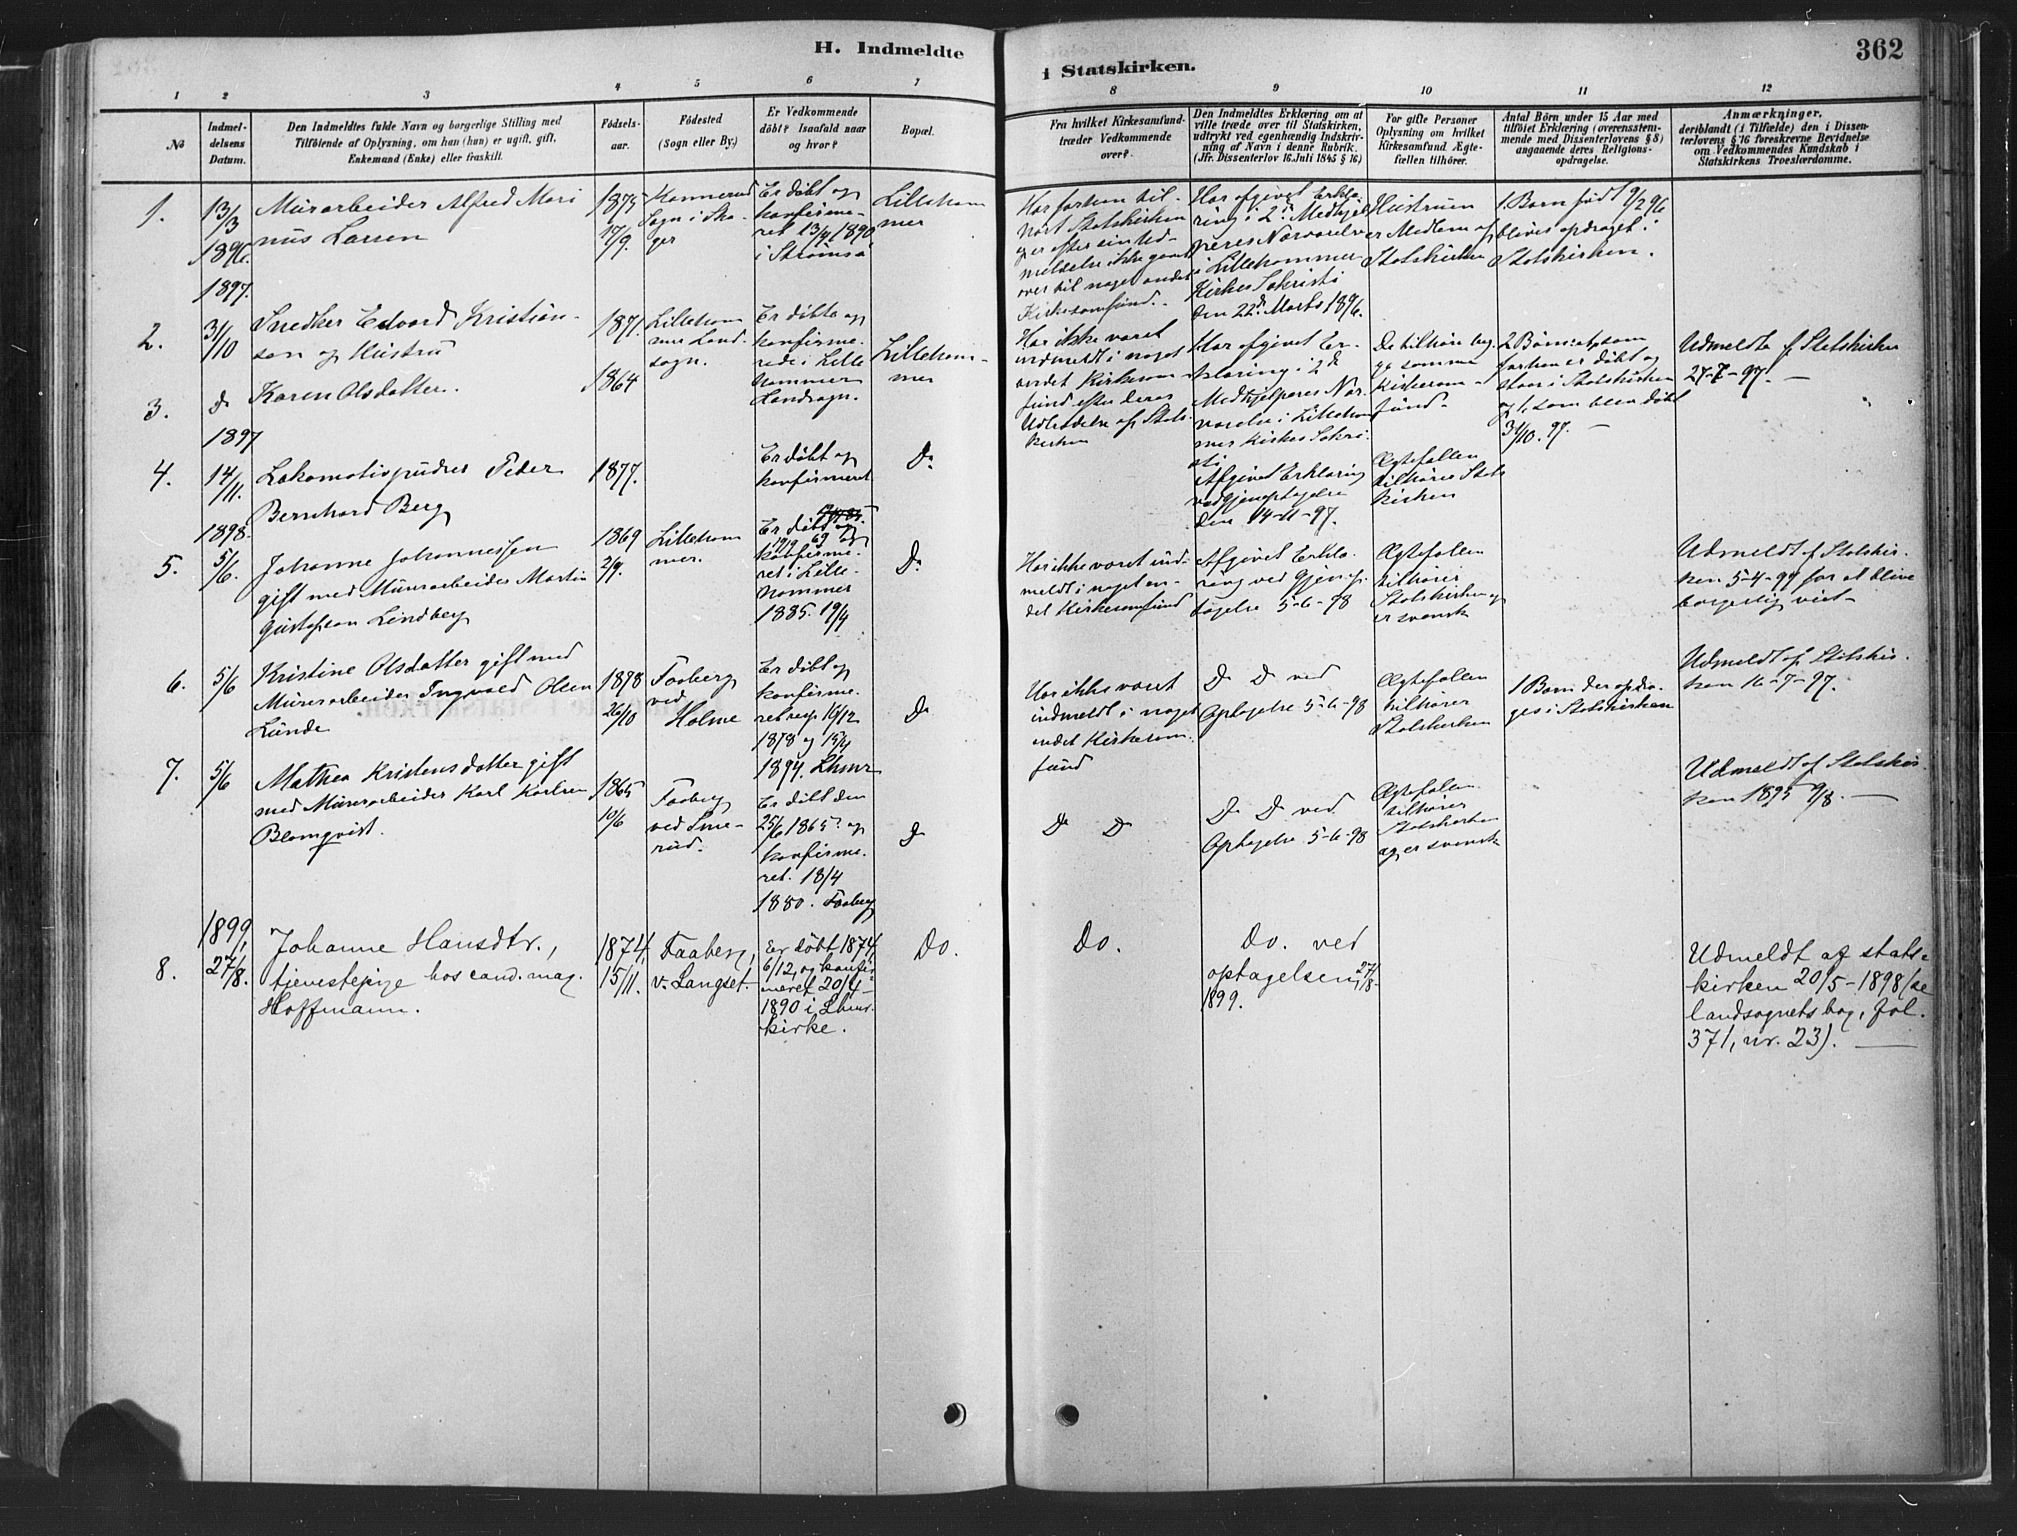 SAH, Fåberg prestekontor, H/Ha/Haa/L0010: Ministerialbok nr. 10, 1879-1900, s. 362